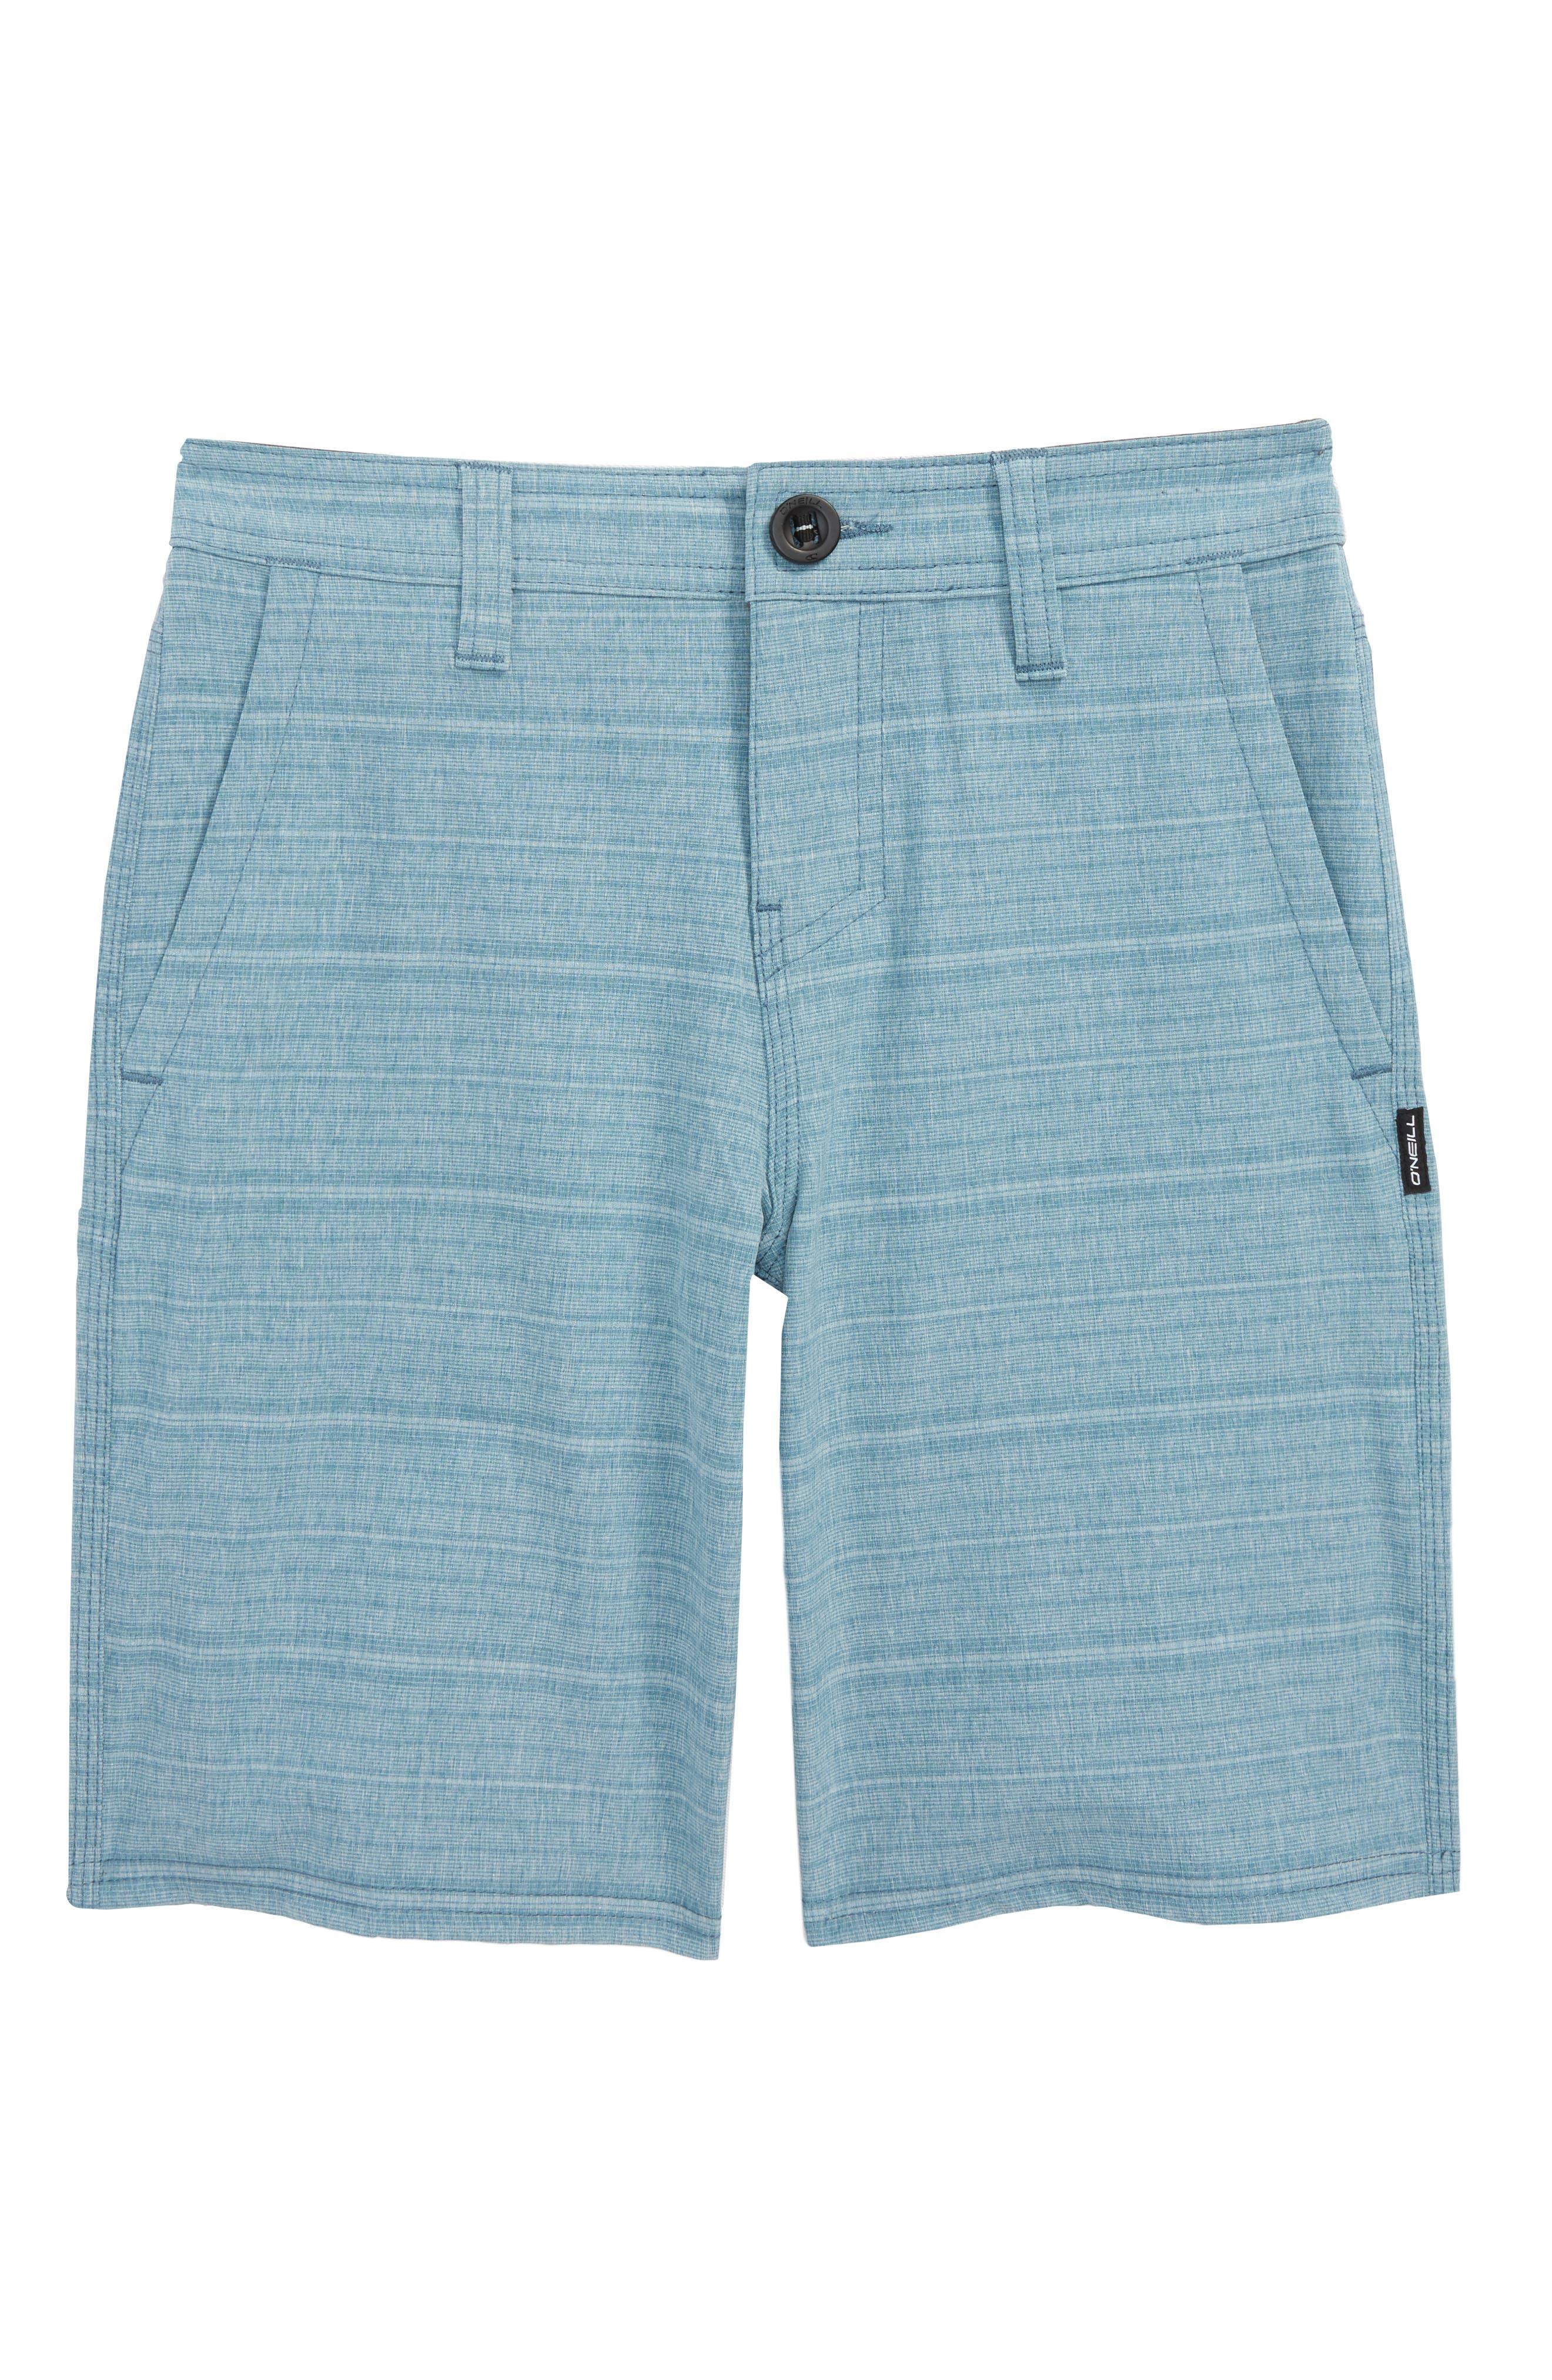 Locked Stripe Hybrid Shorts,                         Main,                         color, Deep Teal